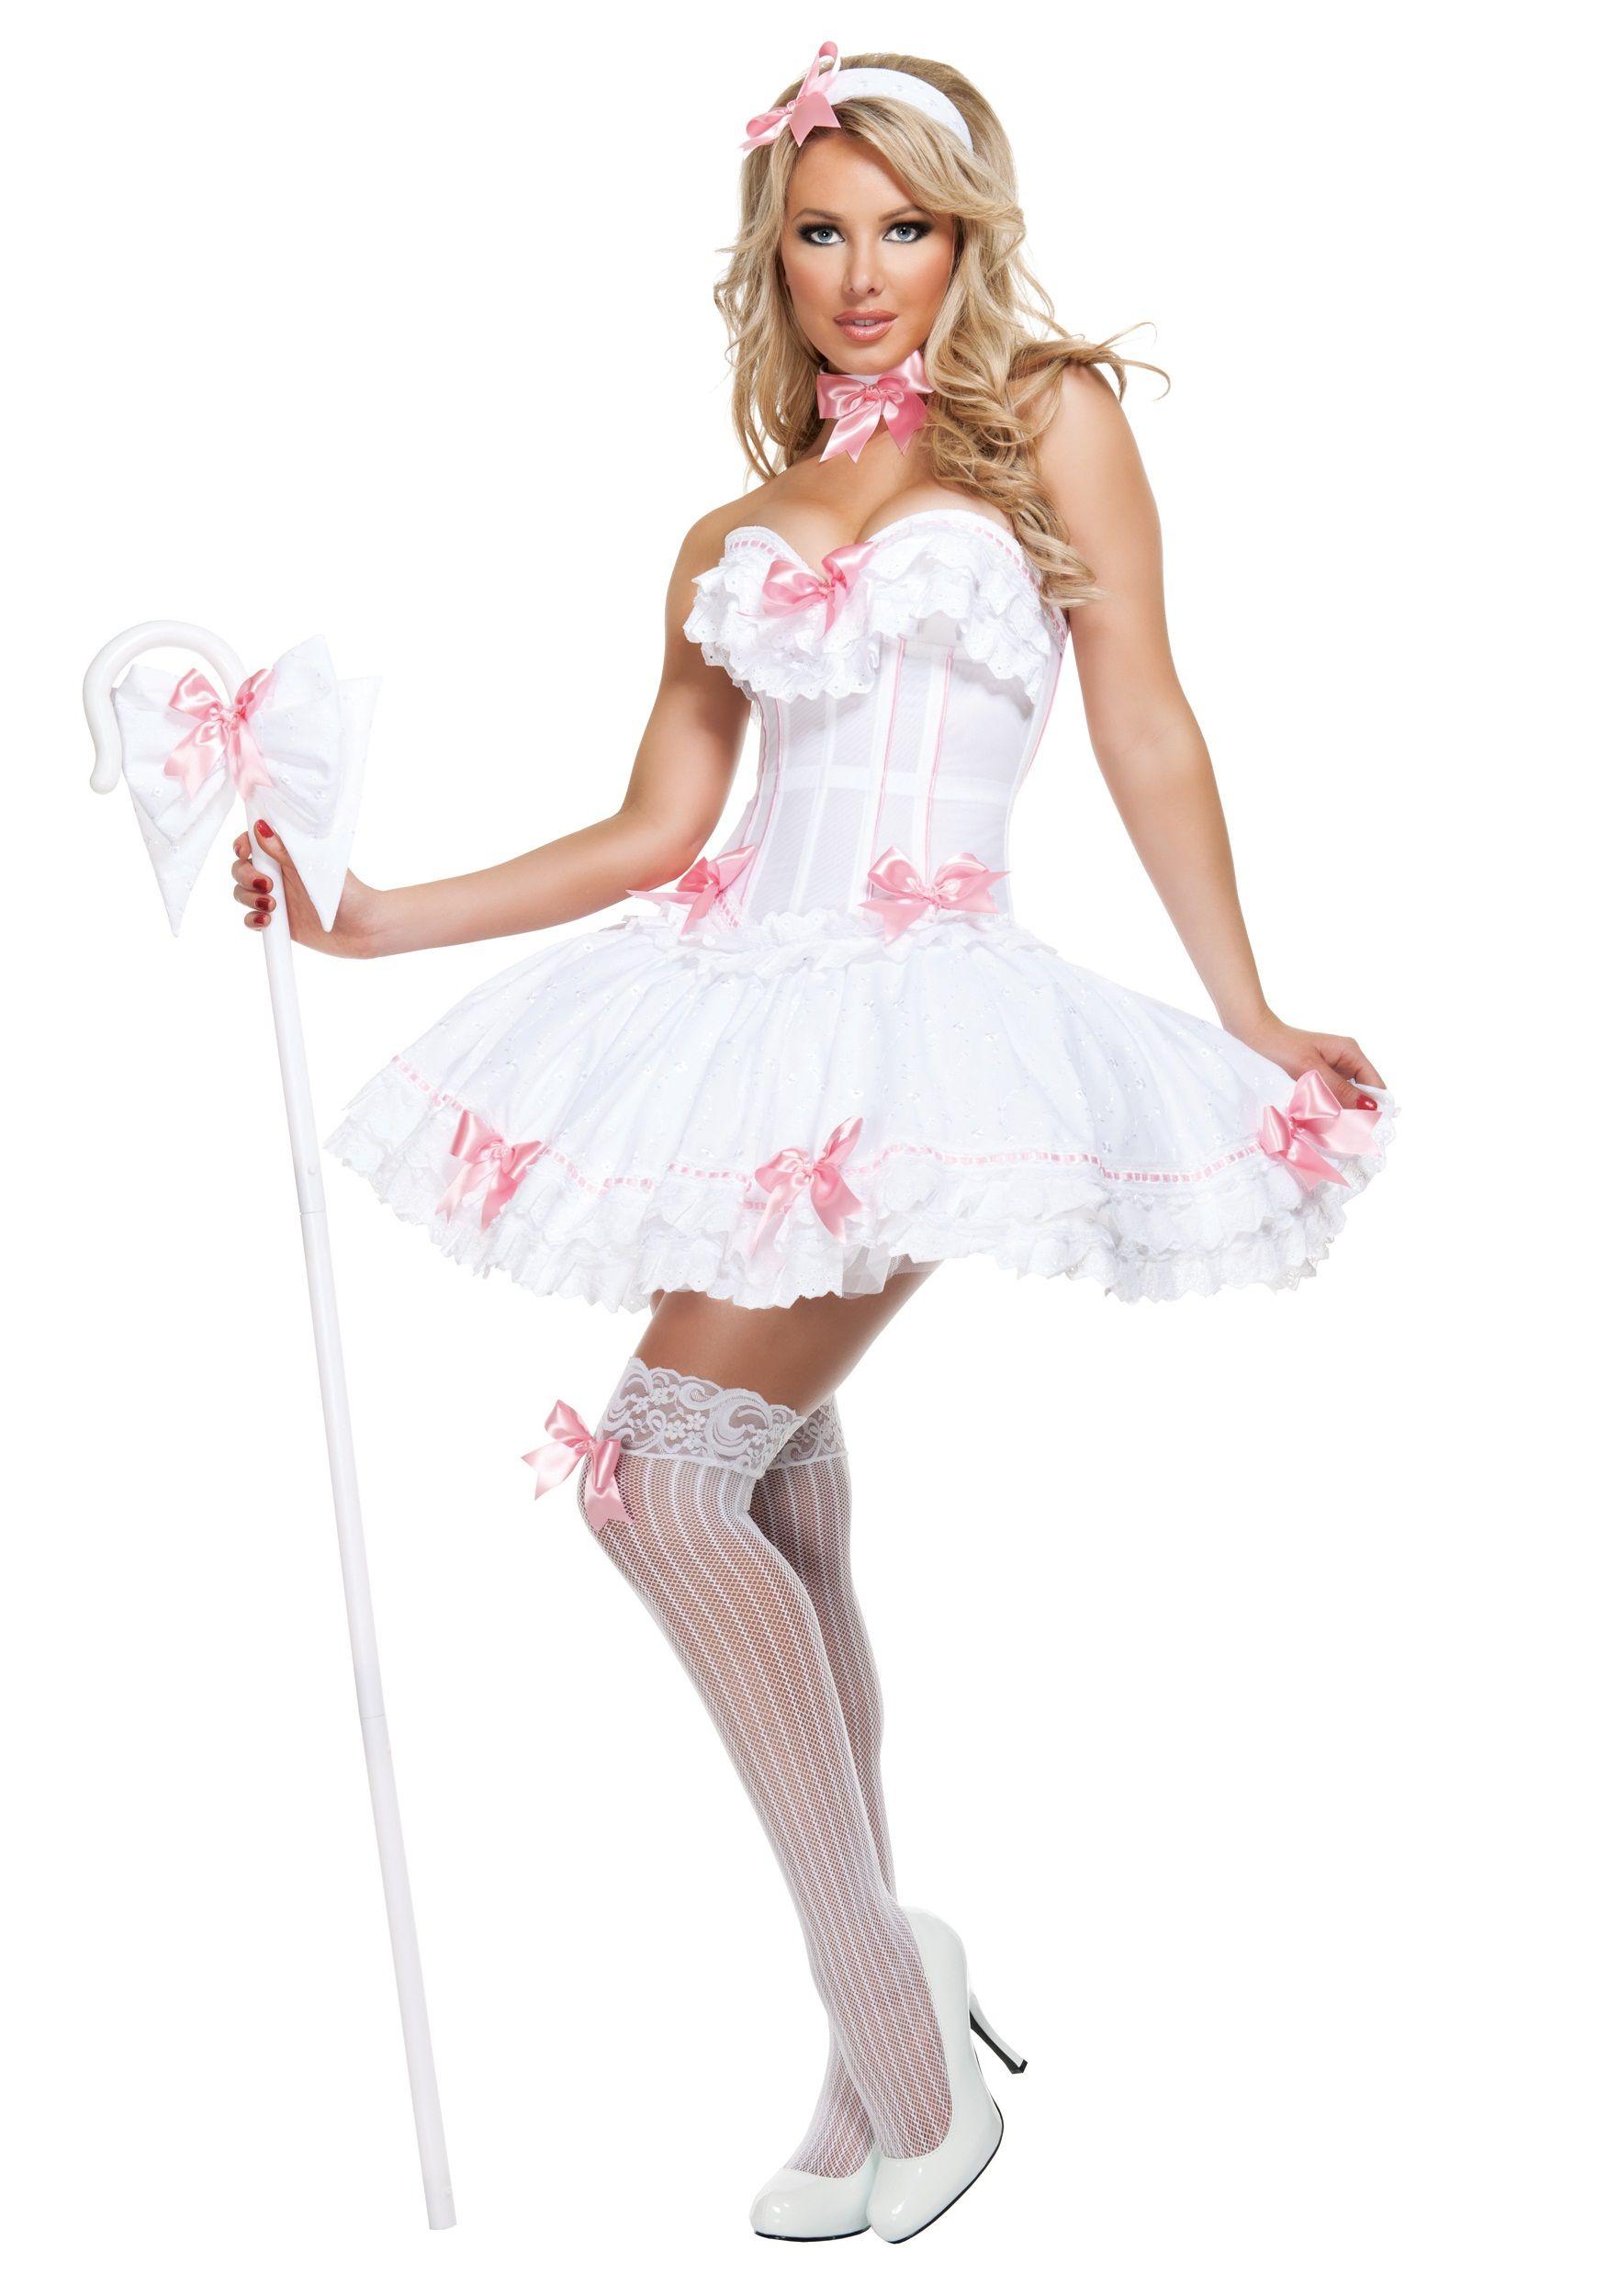 Little bo peep costumes